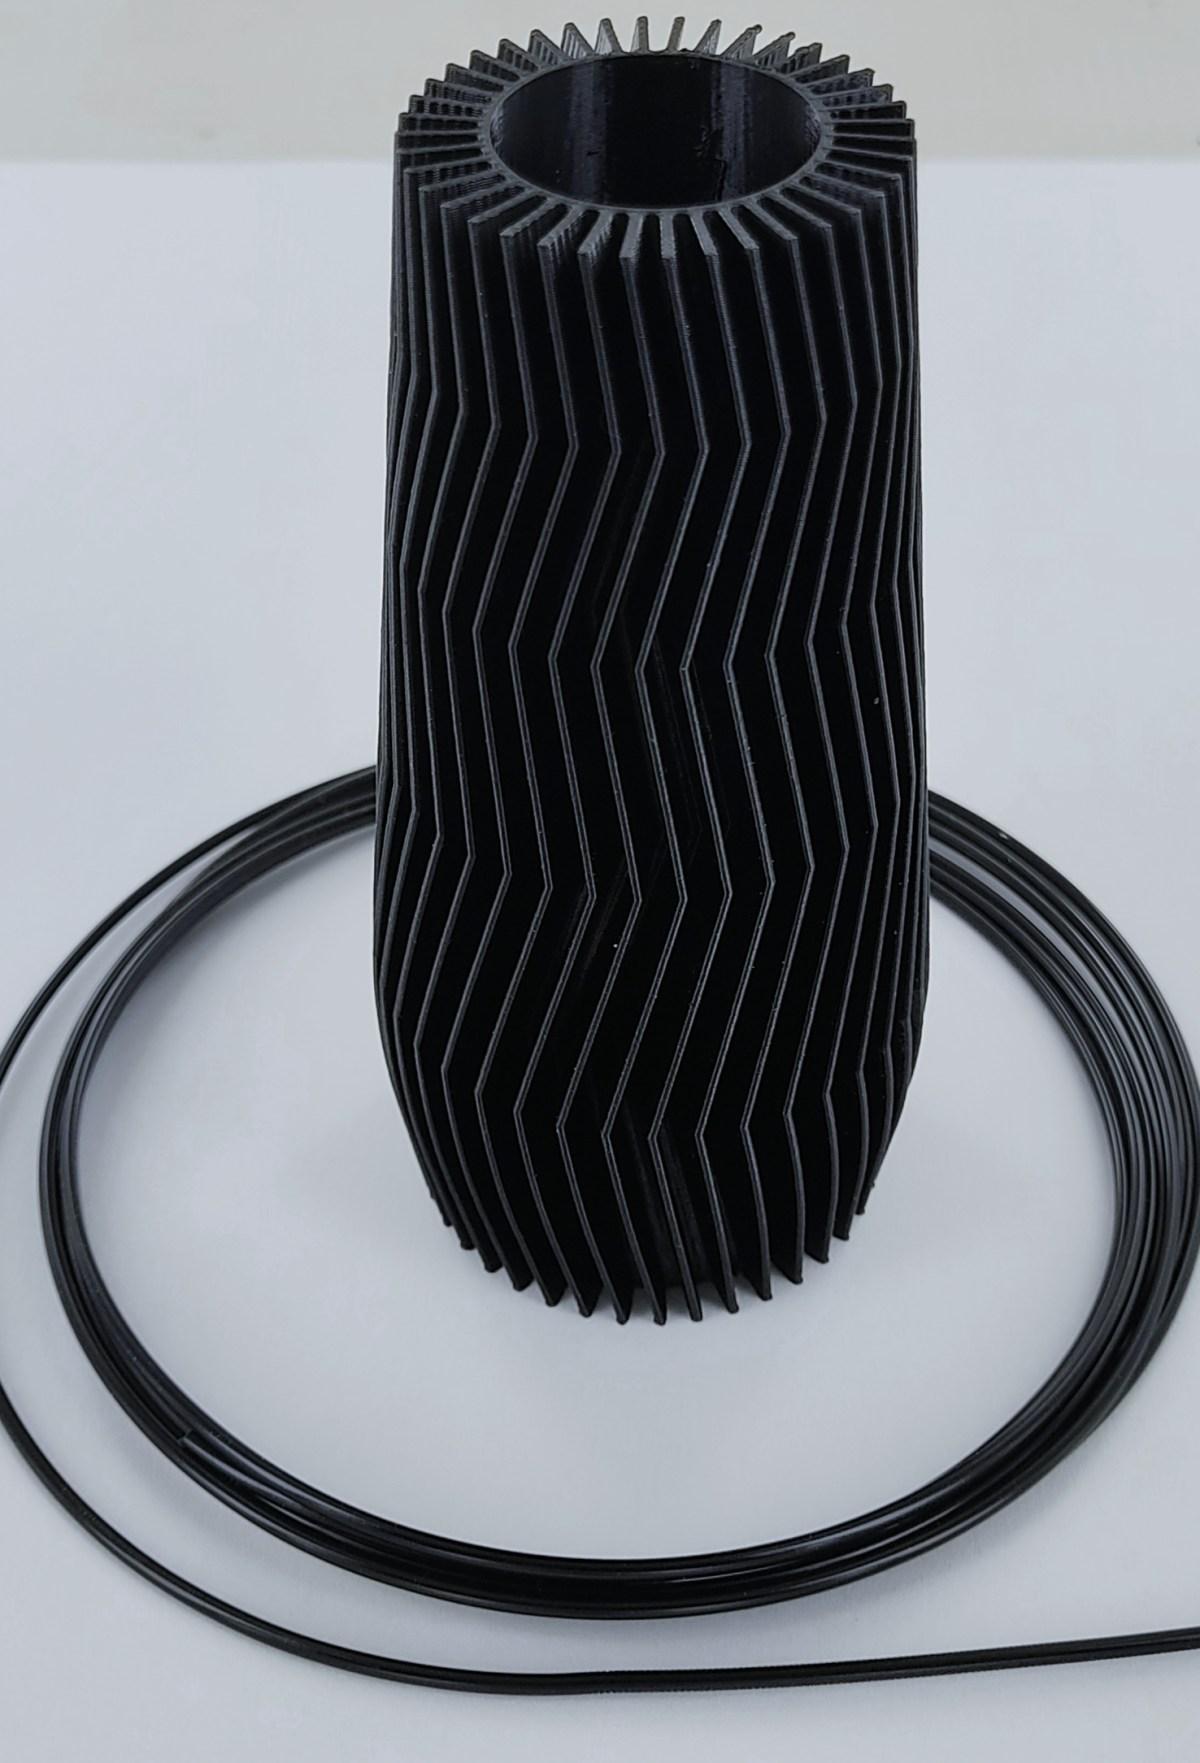 Impression avec filament NEFILA PETG black